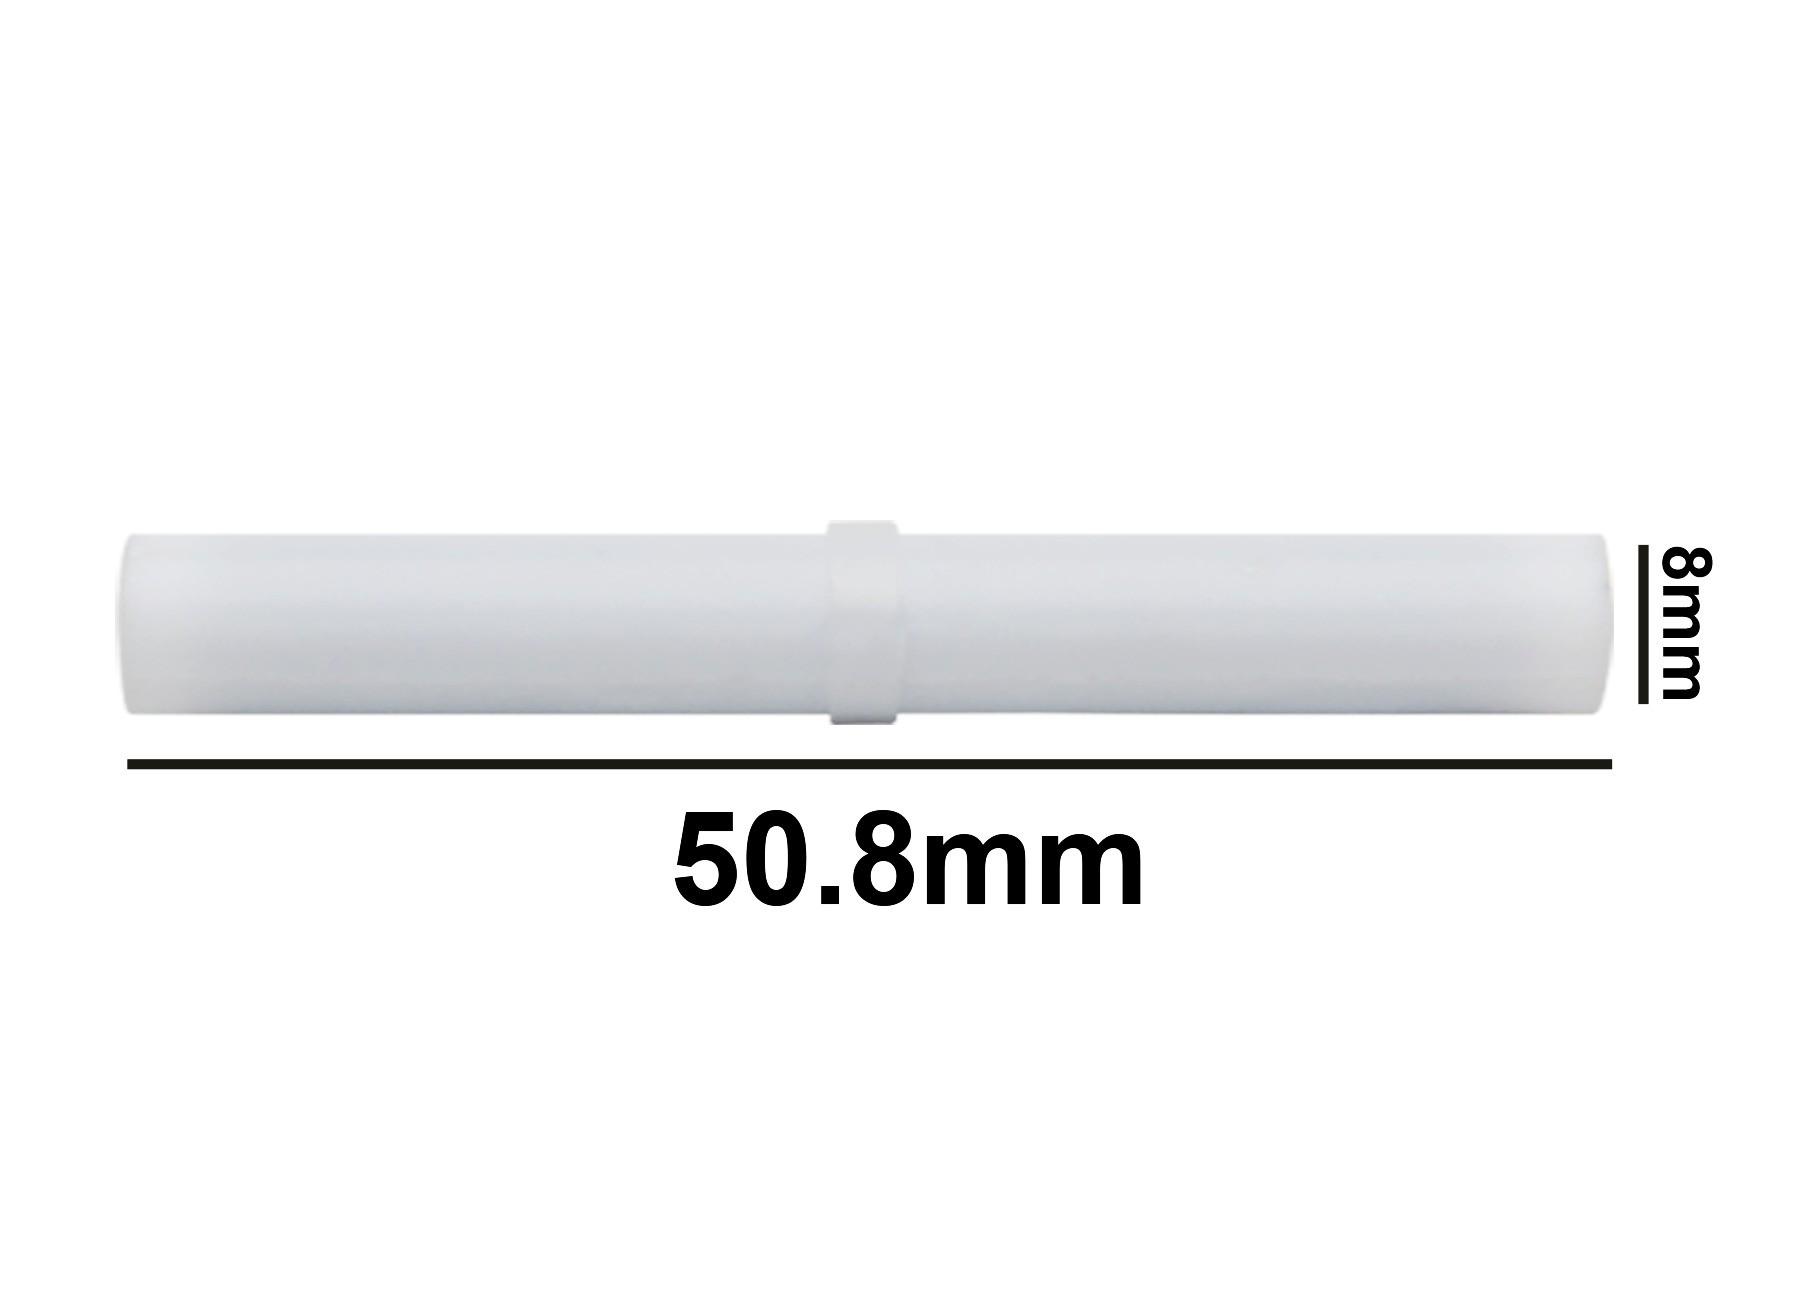 SP Bel-Art Spinbar Teflon Cylindrical Magnetic Stirring Bar; 50.8 x 8mm, White